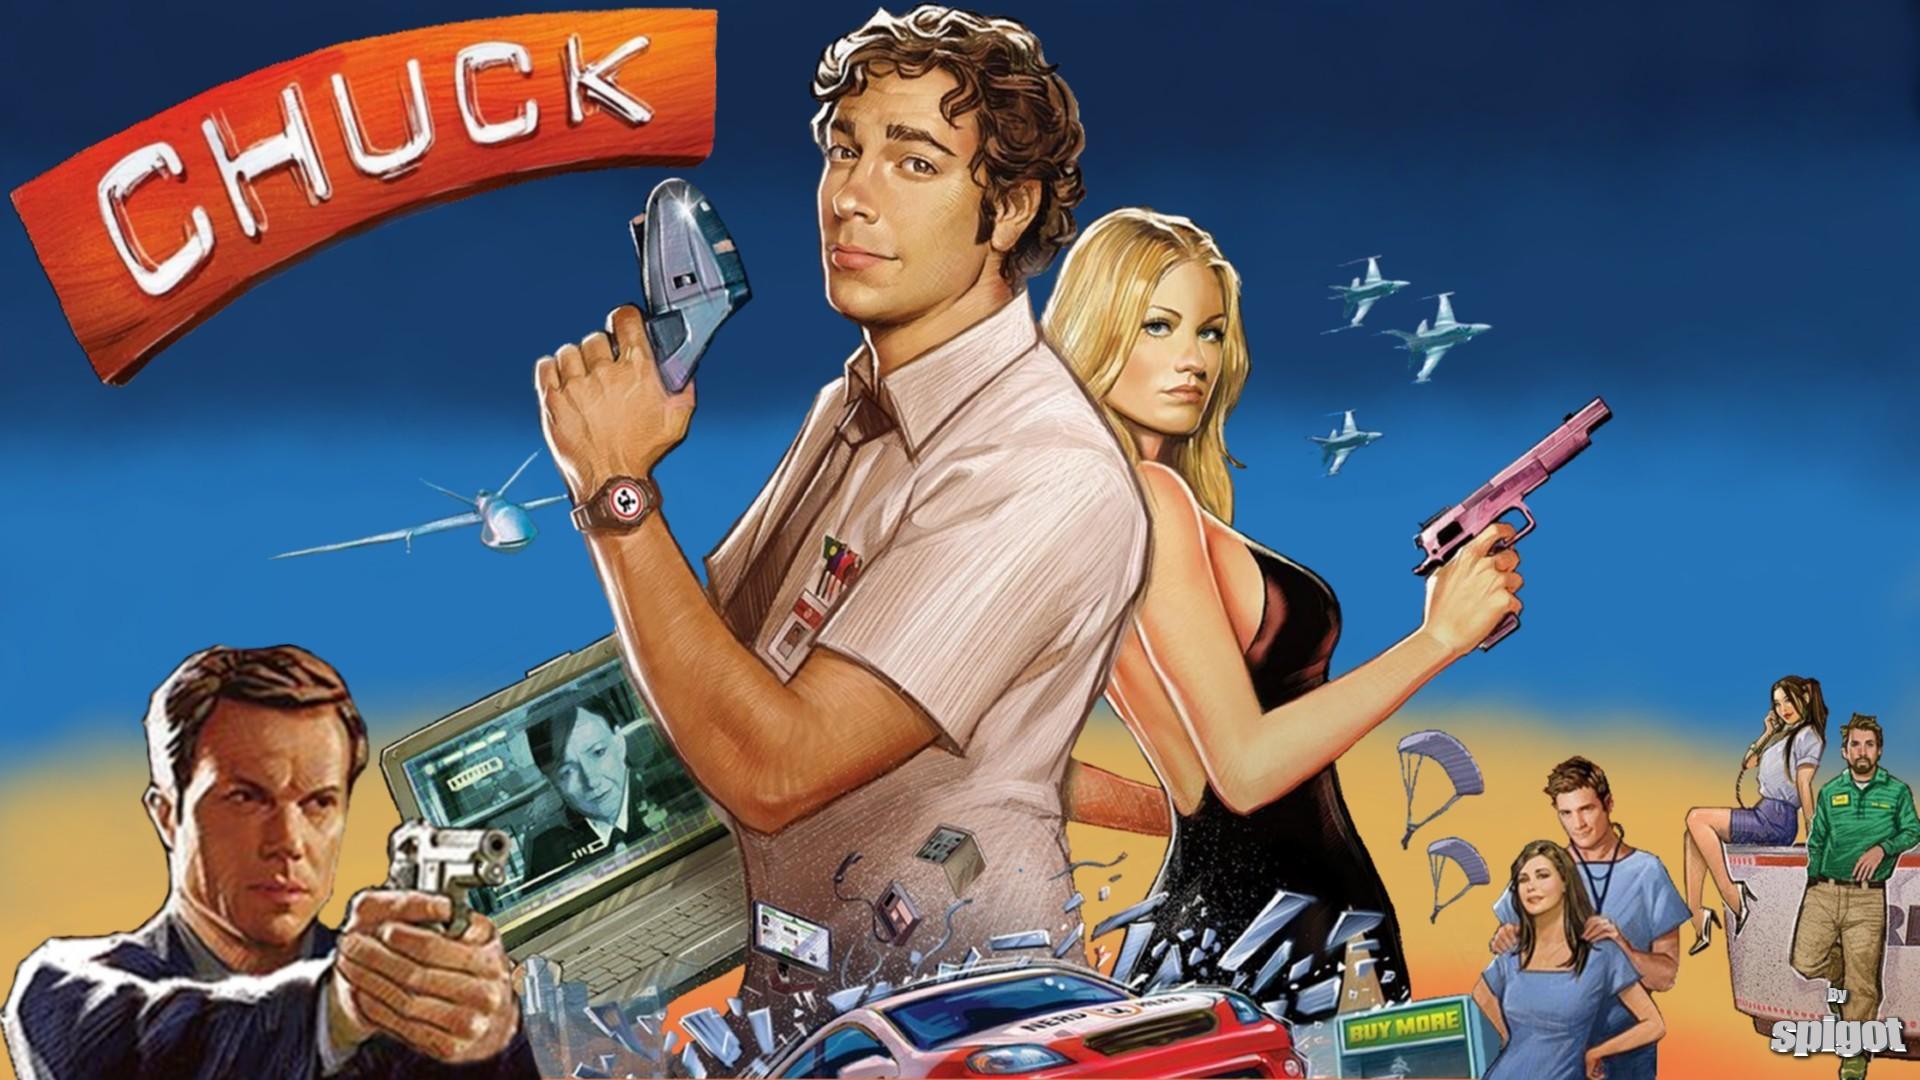 chuck-01.jpg